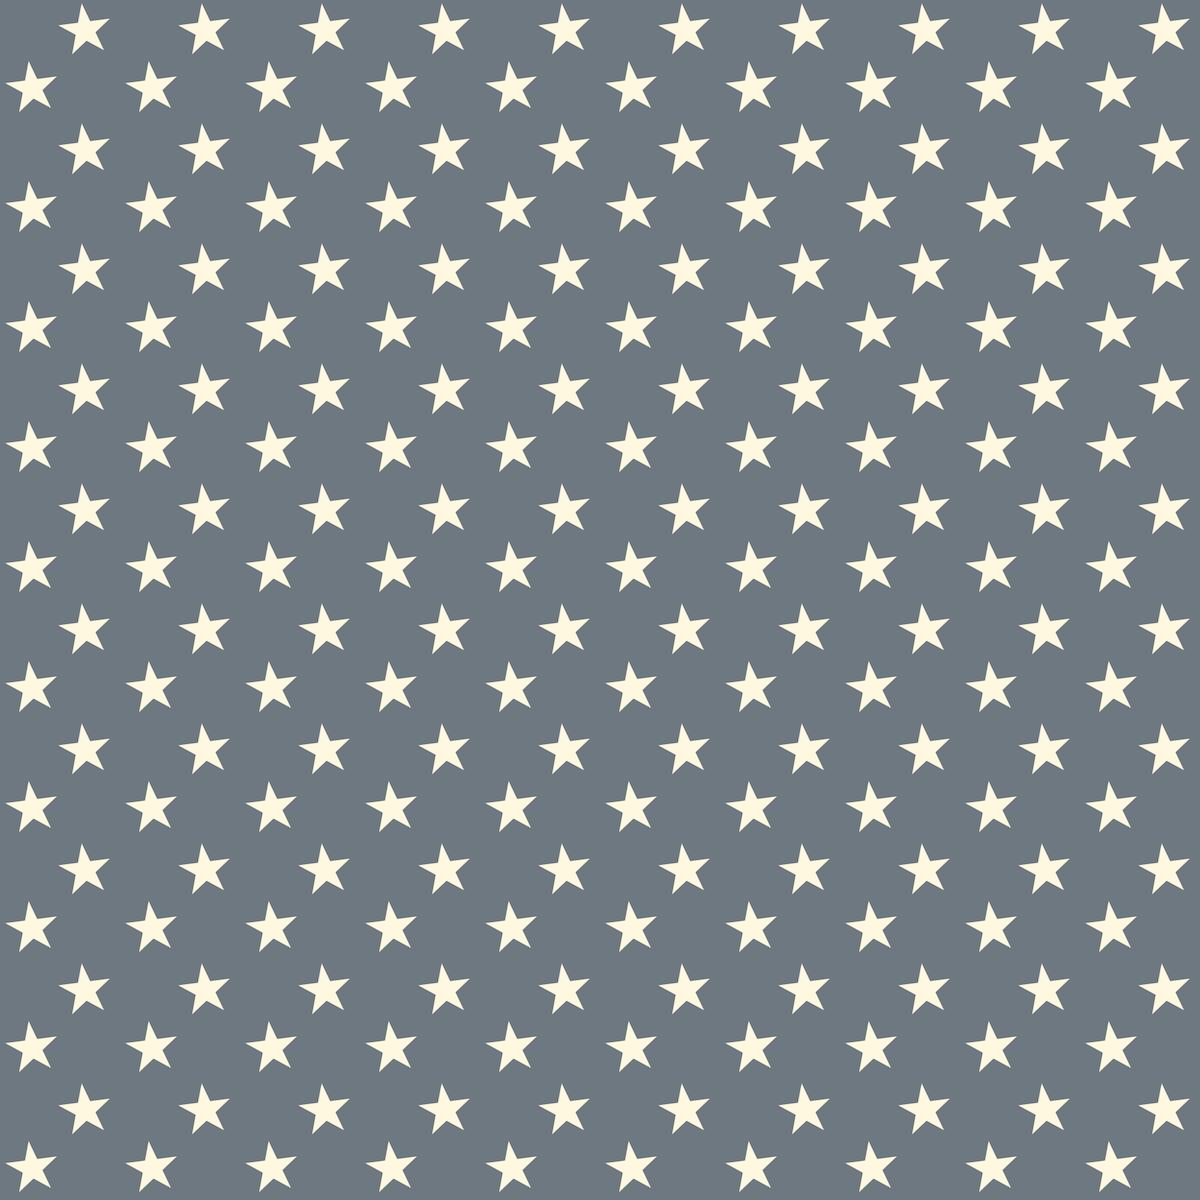 Grey Polka Dot Wallpaper Border Wallpapersafari